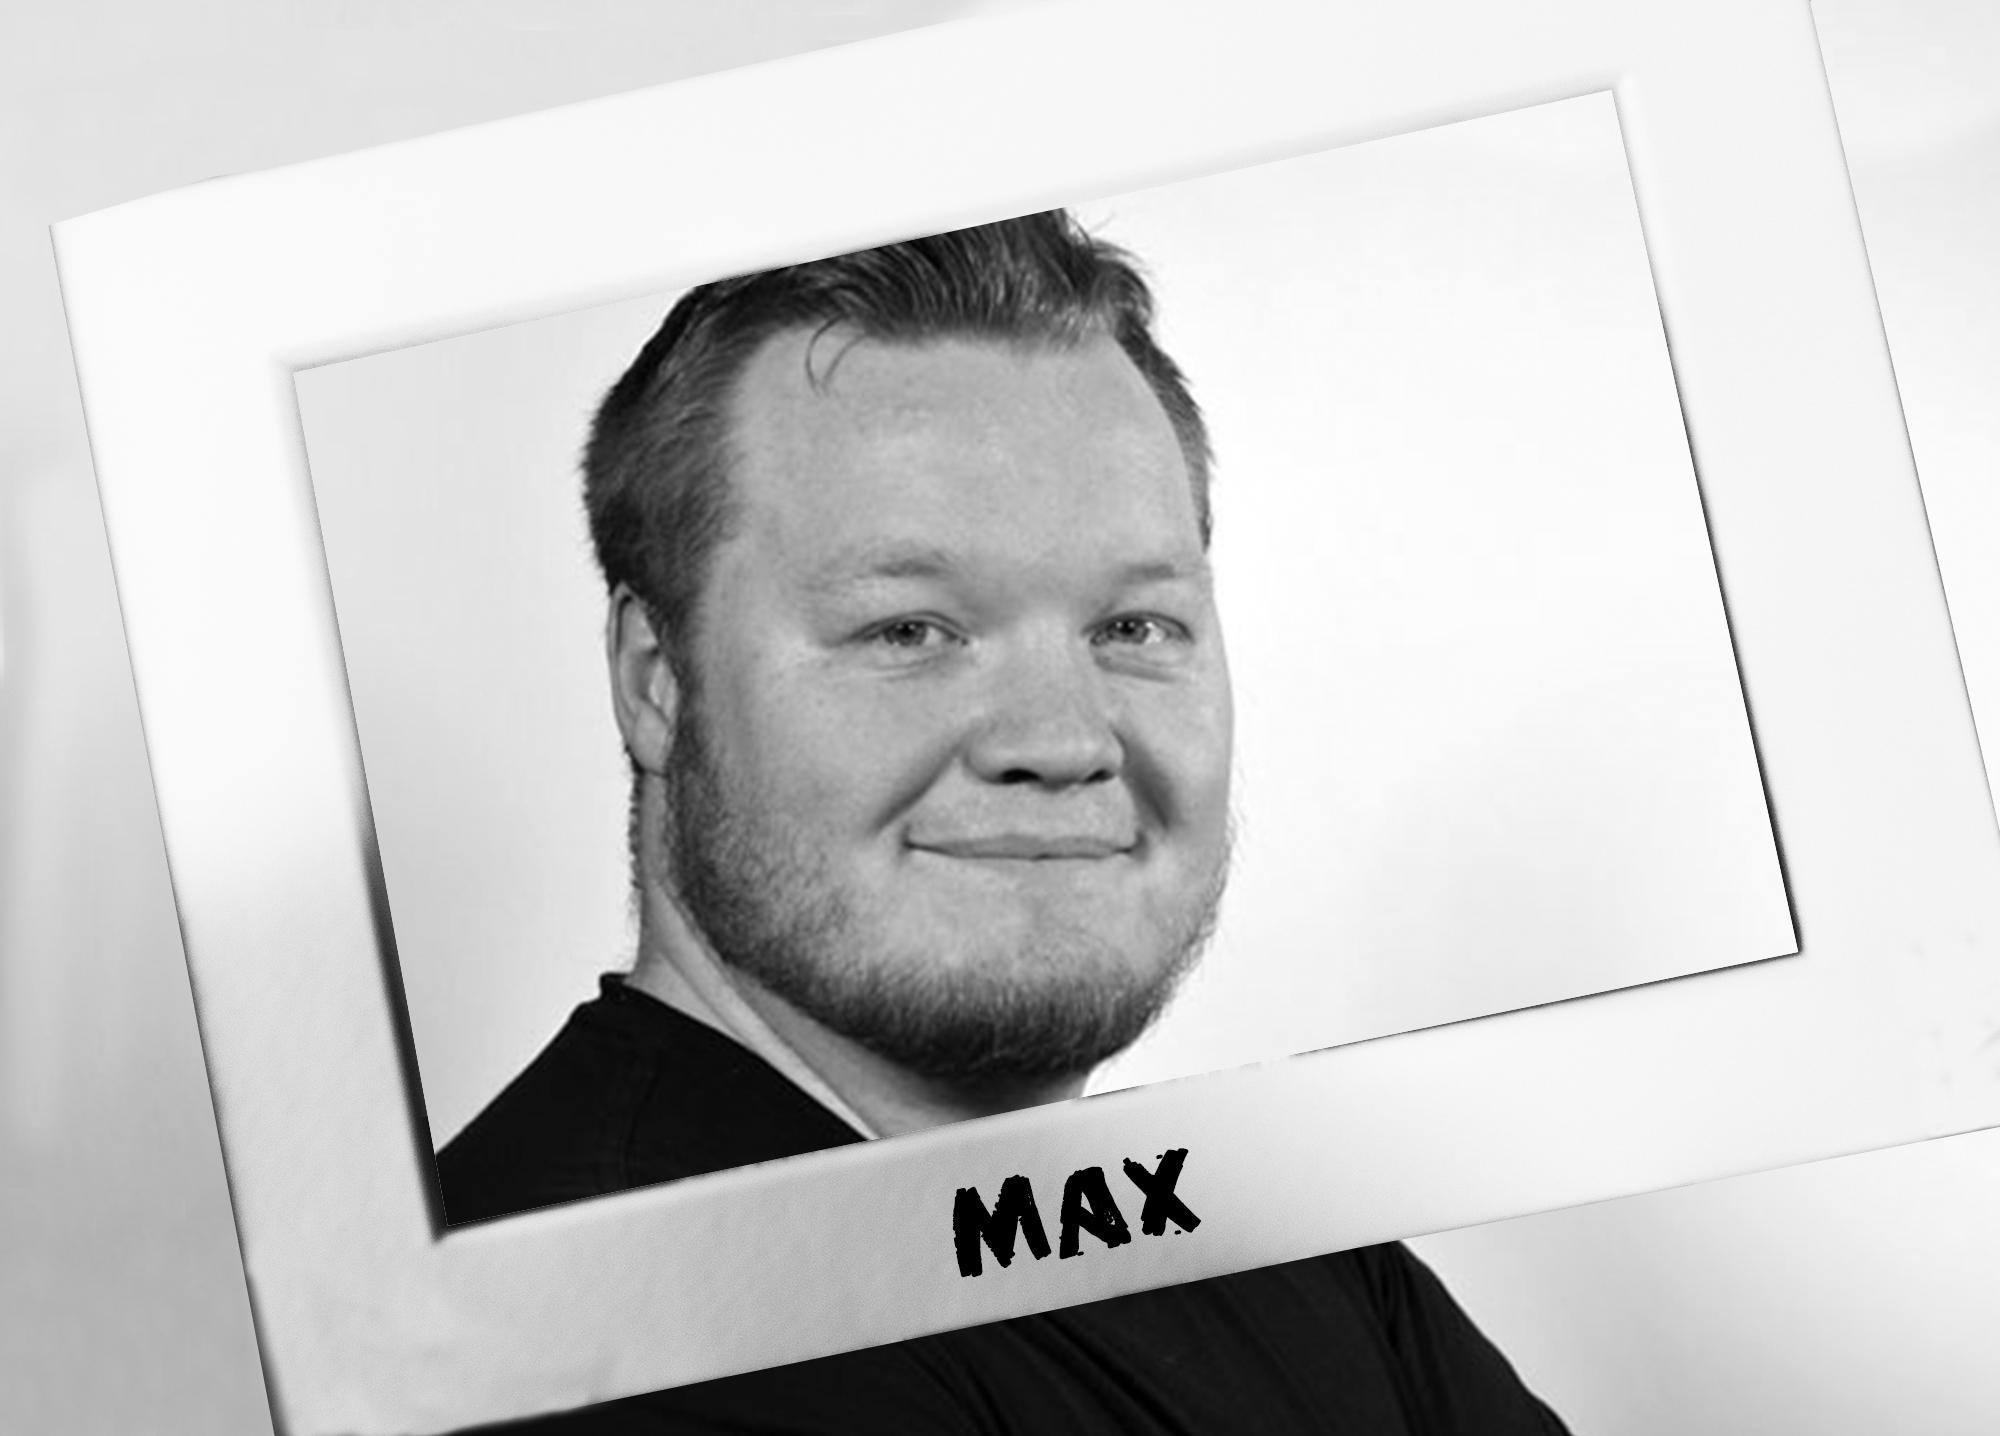 Max Grummel